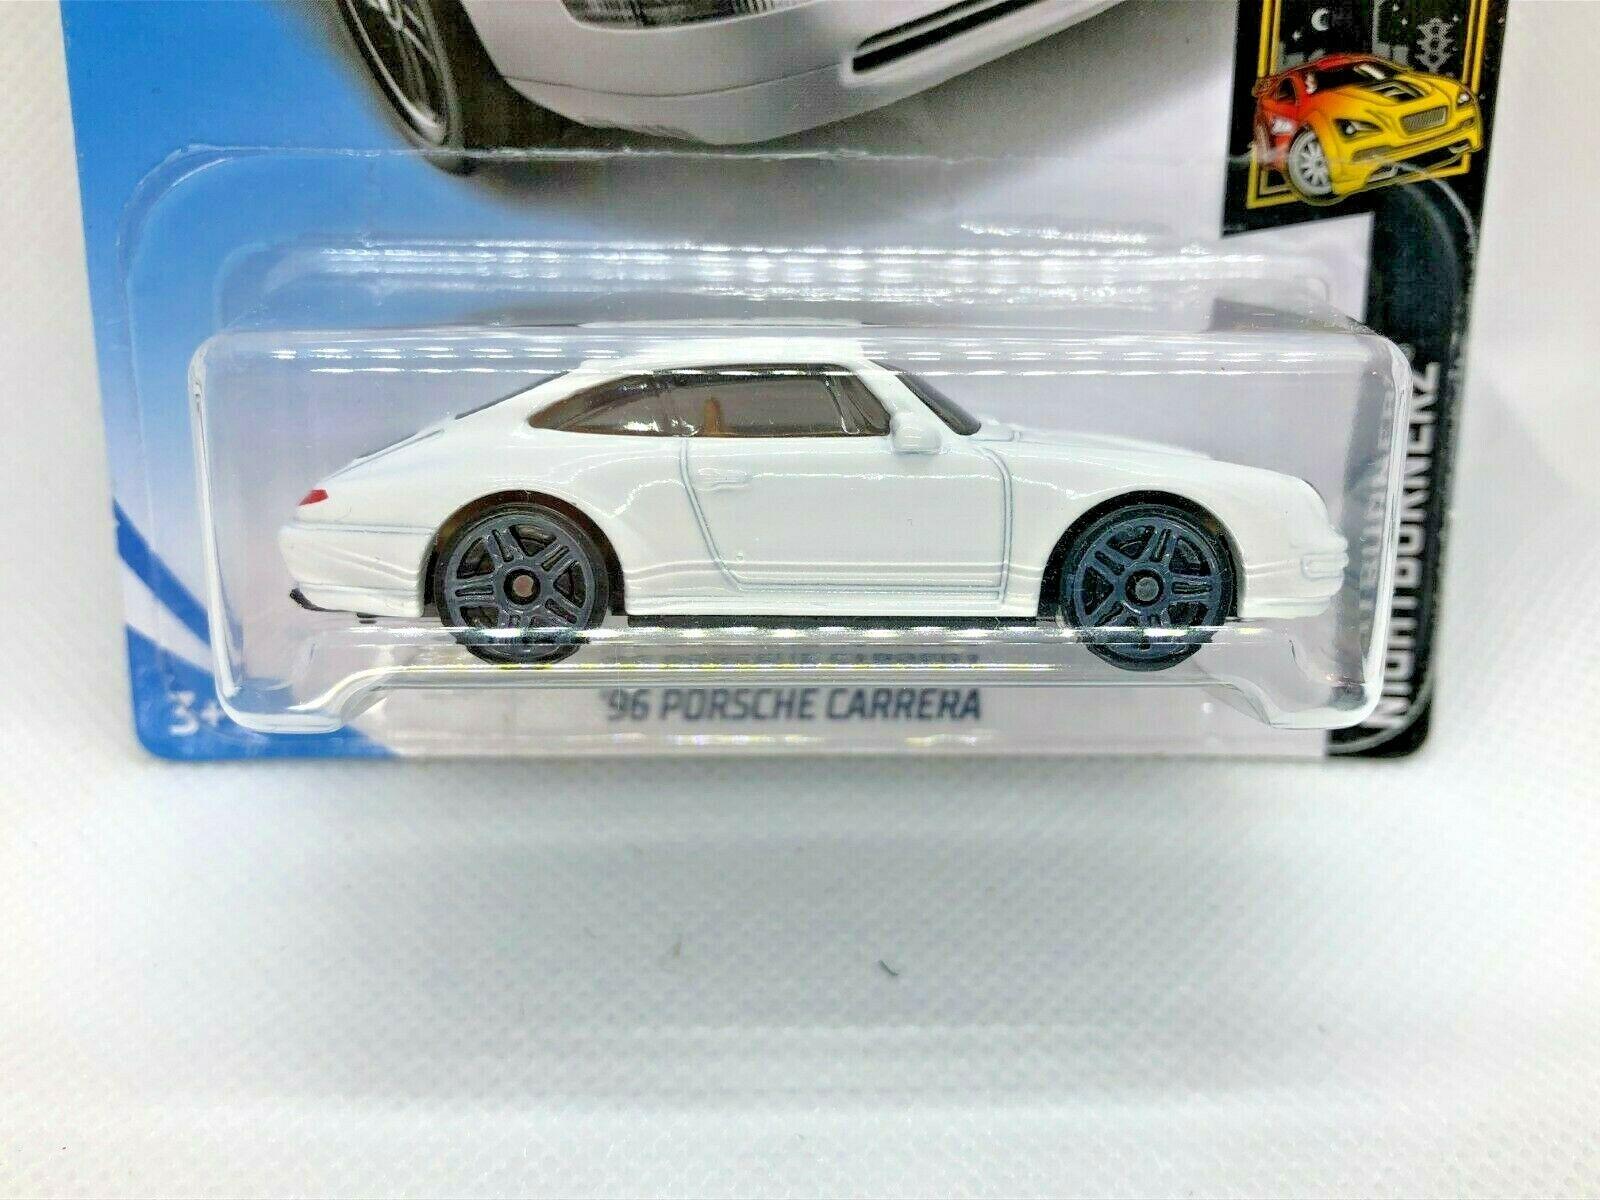 96 Porsche Carrera